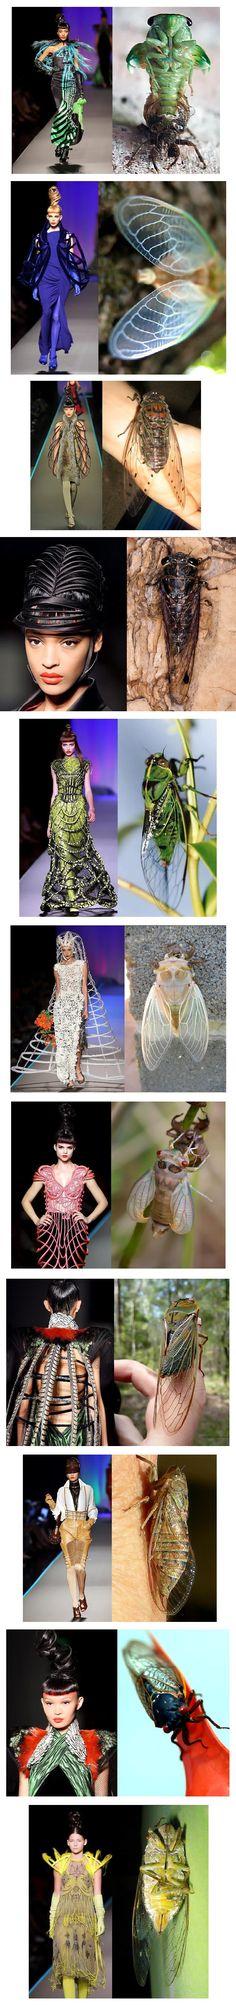 ❣Jean Paul Gaultier | Metamorphosis 2014 article butterflies galore Jean Paul Gaultier Spring Couture 2014